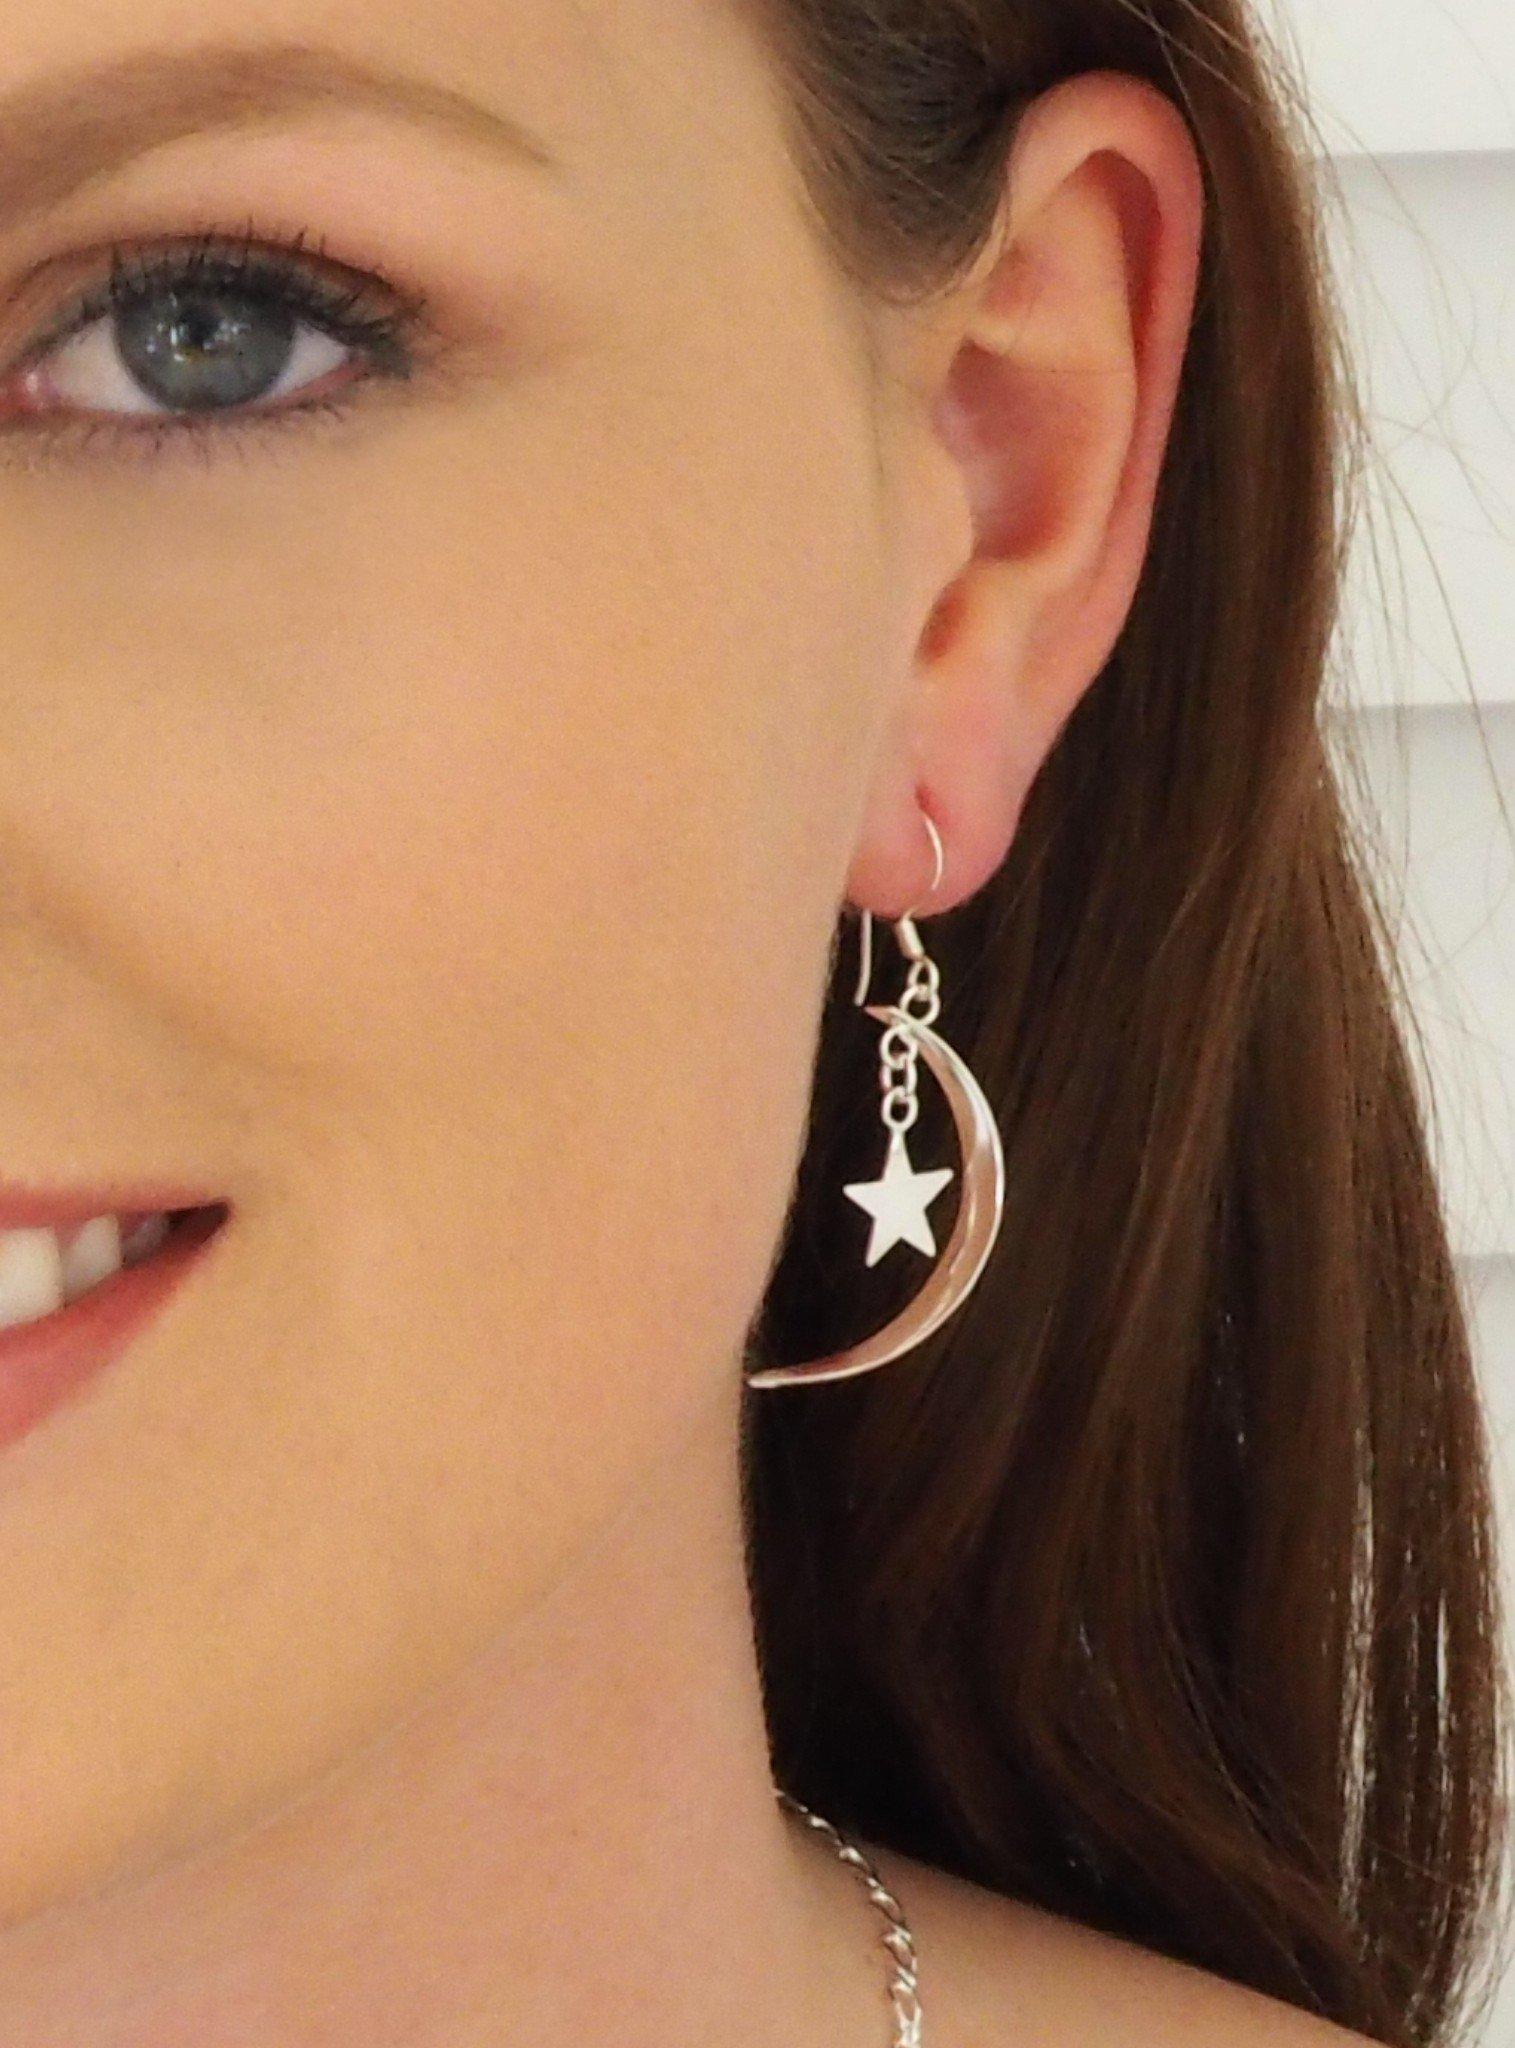 Stars Cresent Moon Earrings in Sterling Silver